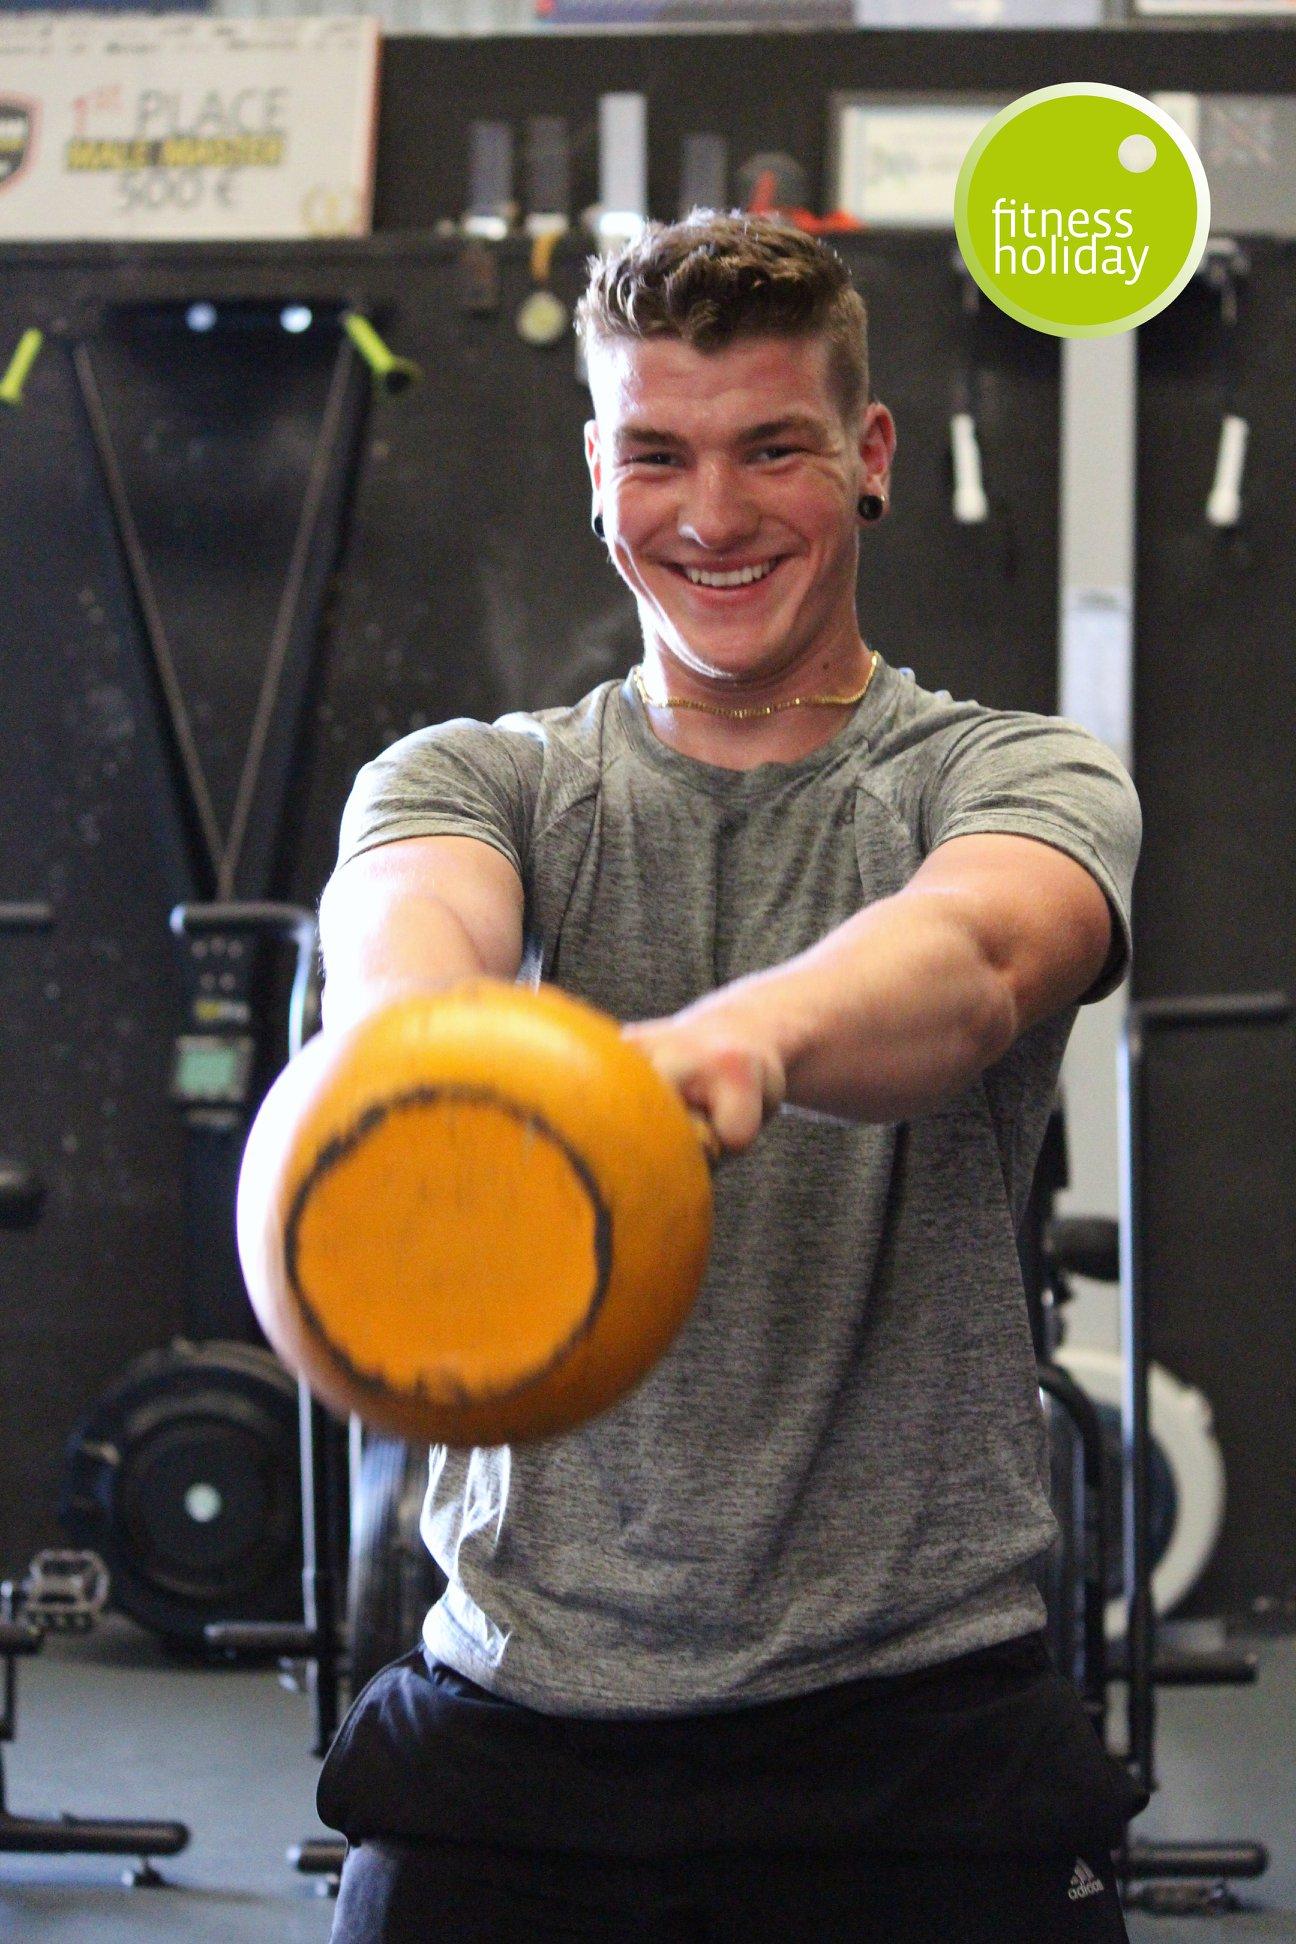 CrossFit Mallorca Functional Bodybuilding Coach Malick